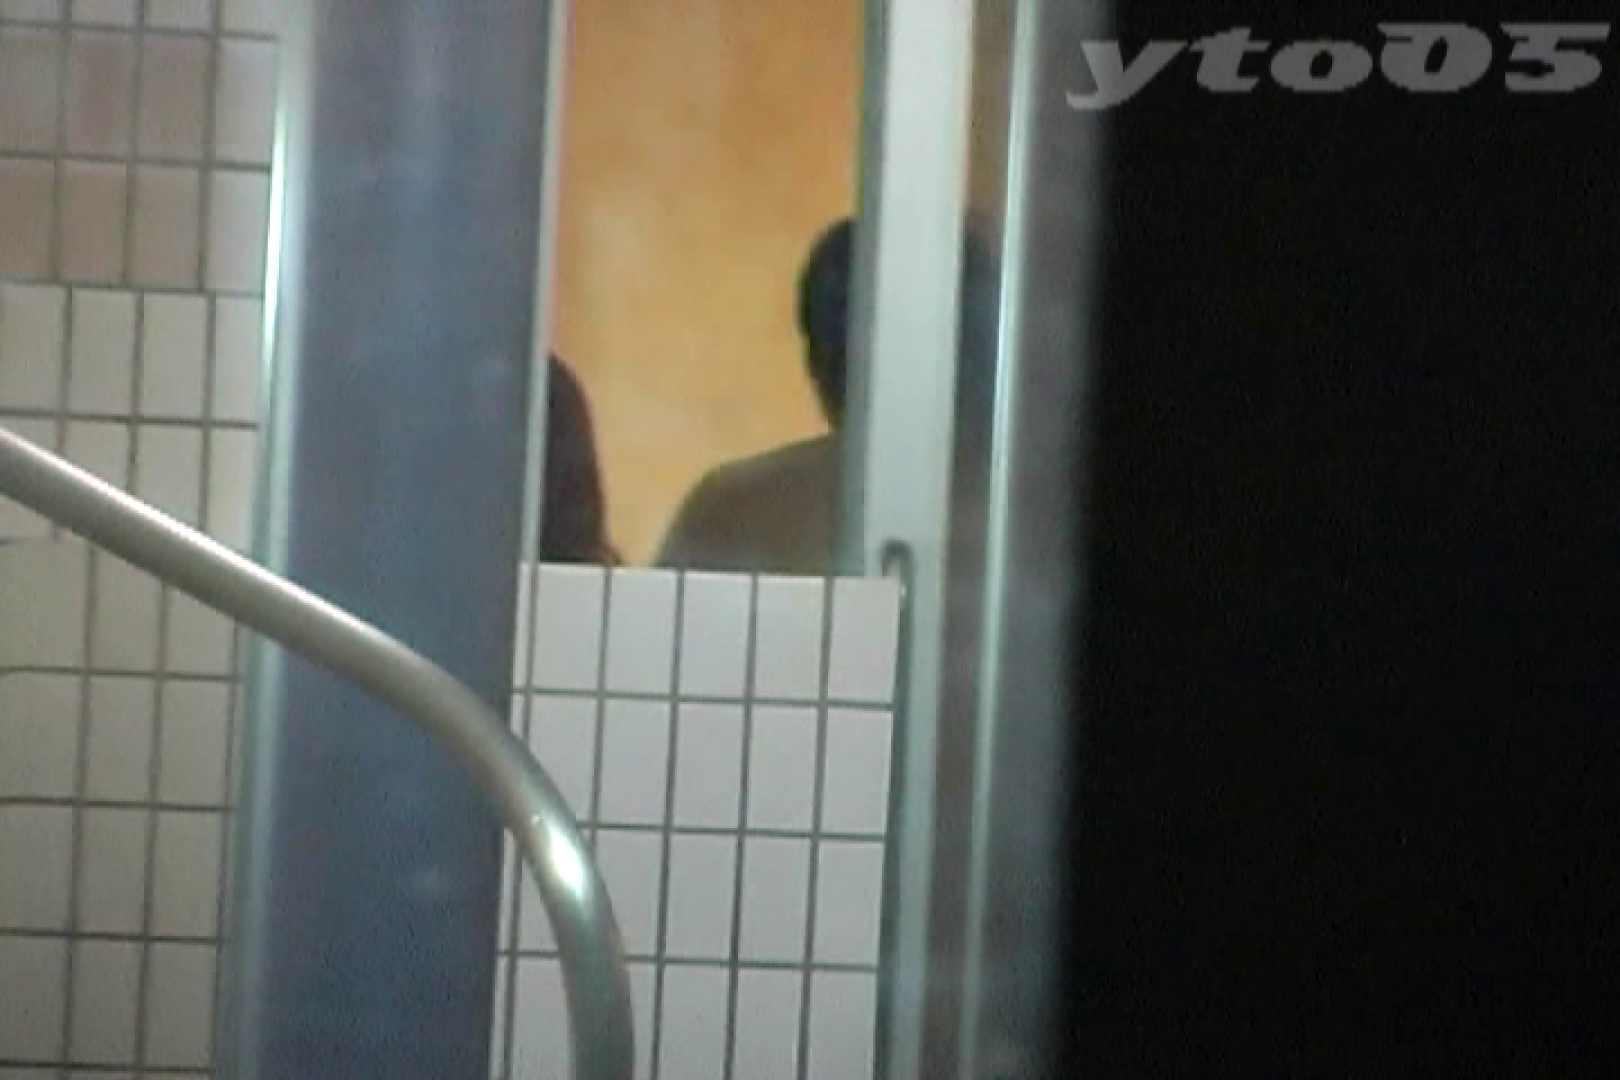 ▲復活限定▲合宿ホテル女風呂盗撮 Vol.31 盗撮で悶絶   女湯  94画像 73